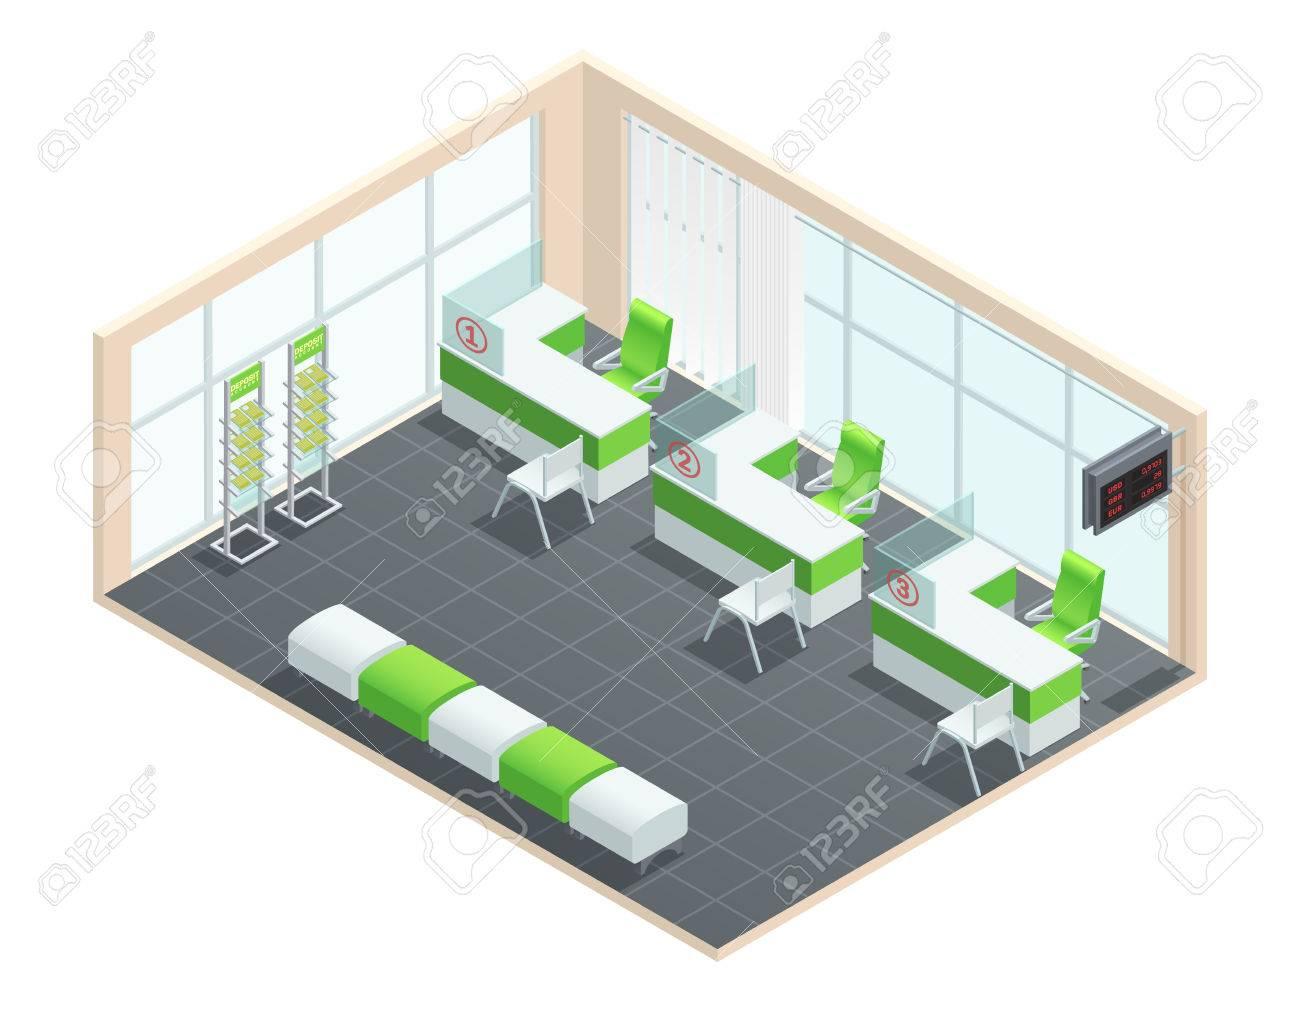 empty rooms polyvore   Empty room, Living room clipart, Design